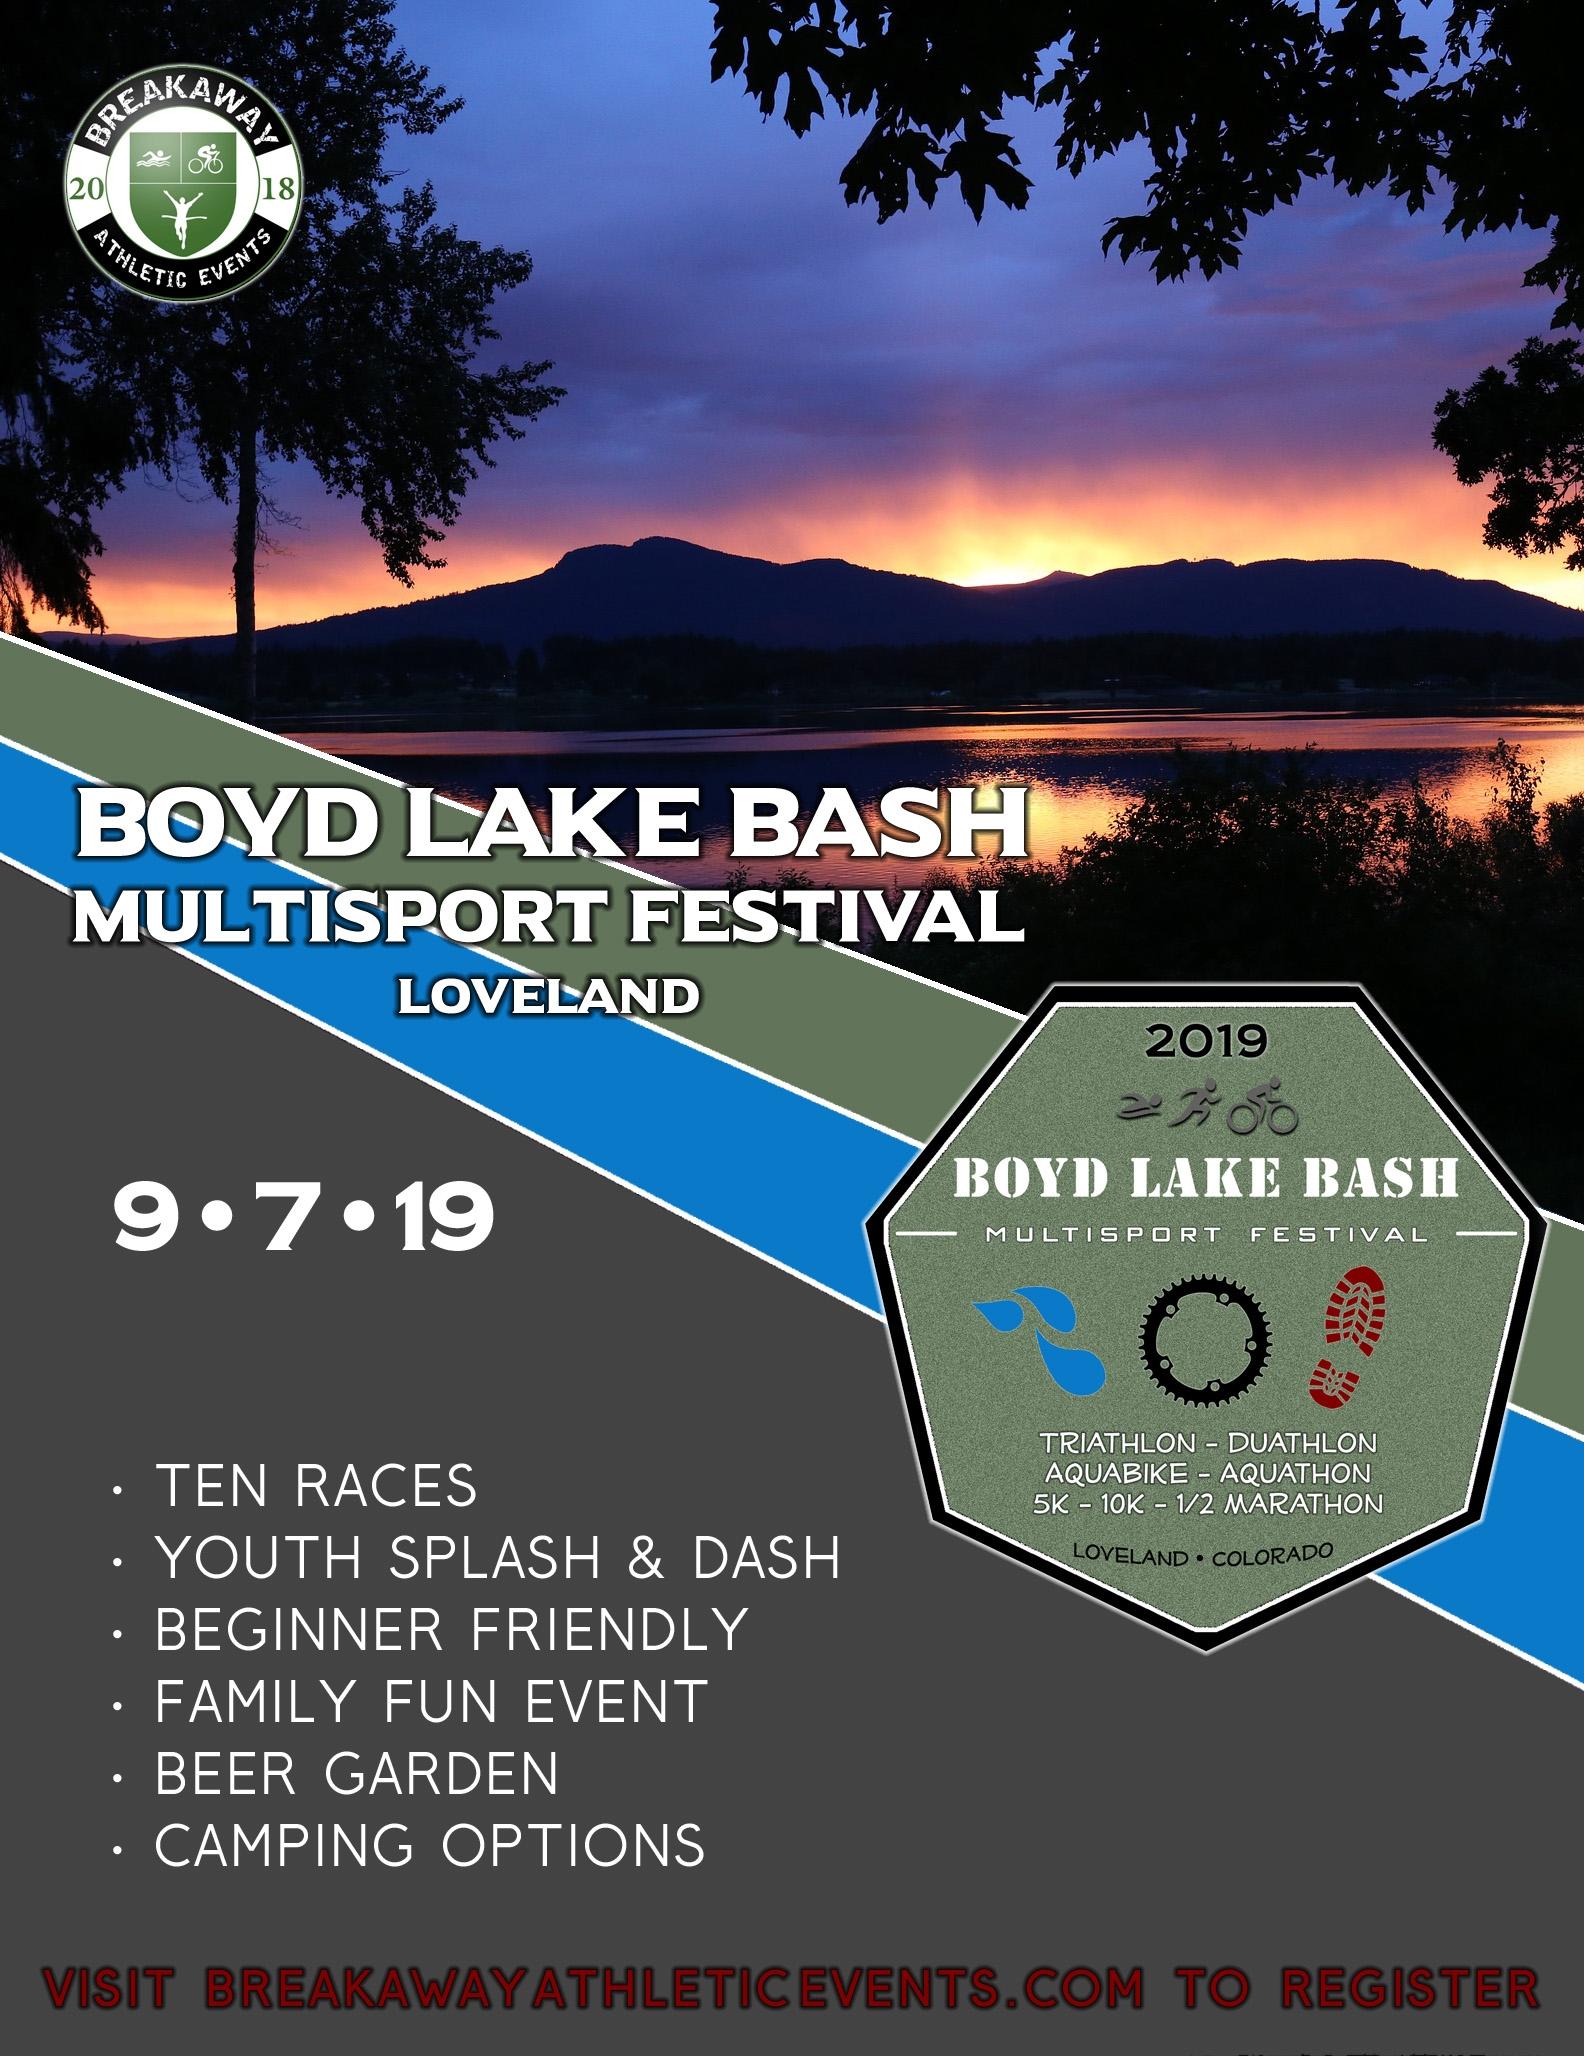 Boyd Lake Bash Multisport Festival | Aquathlon | Loveland, Colorado